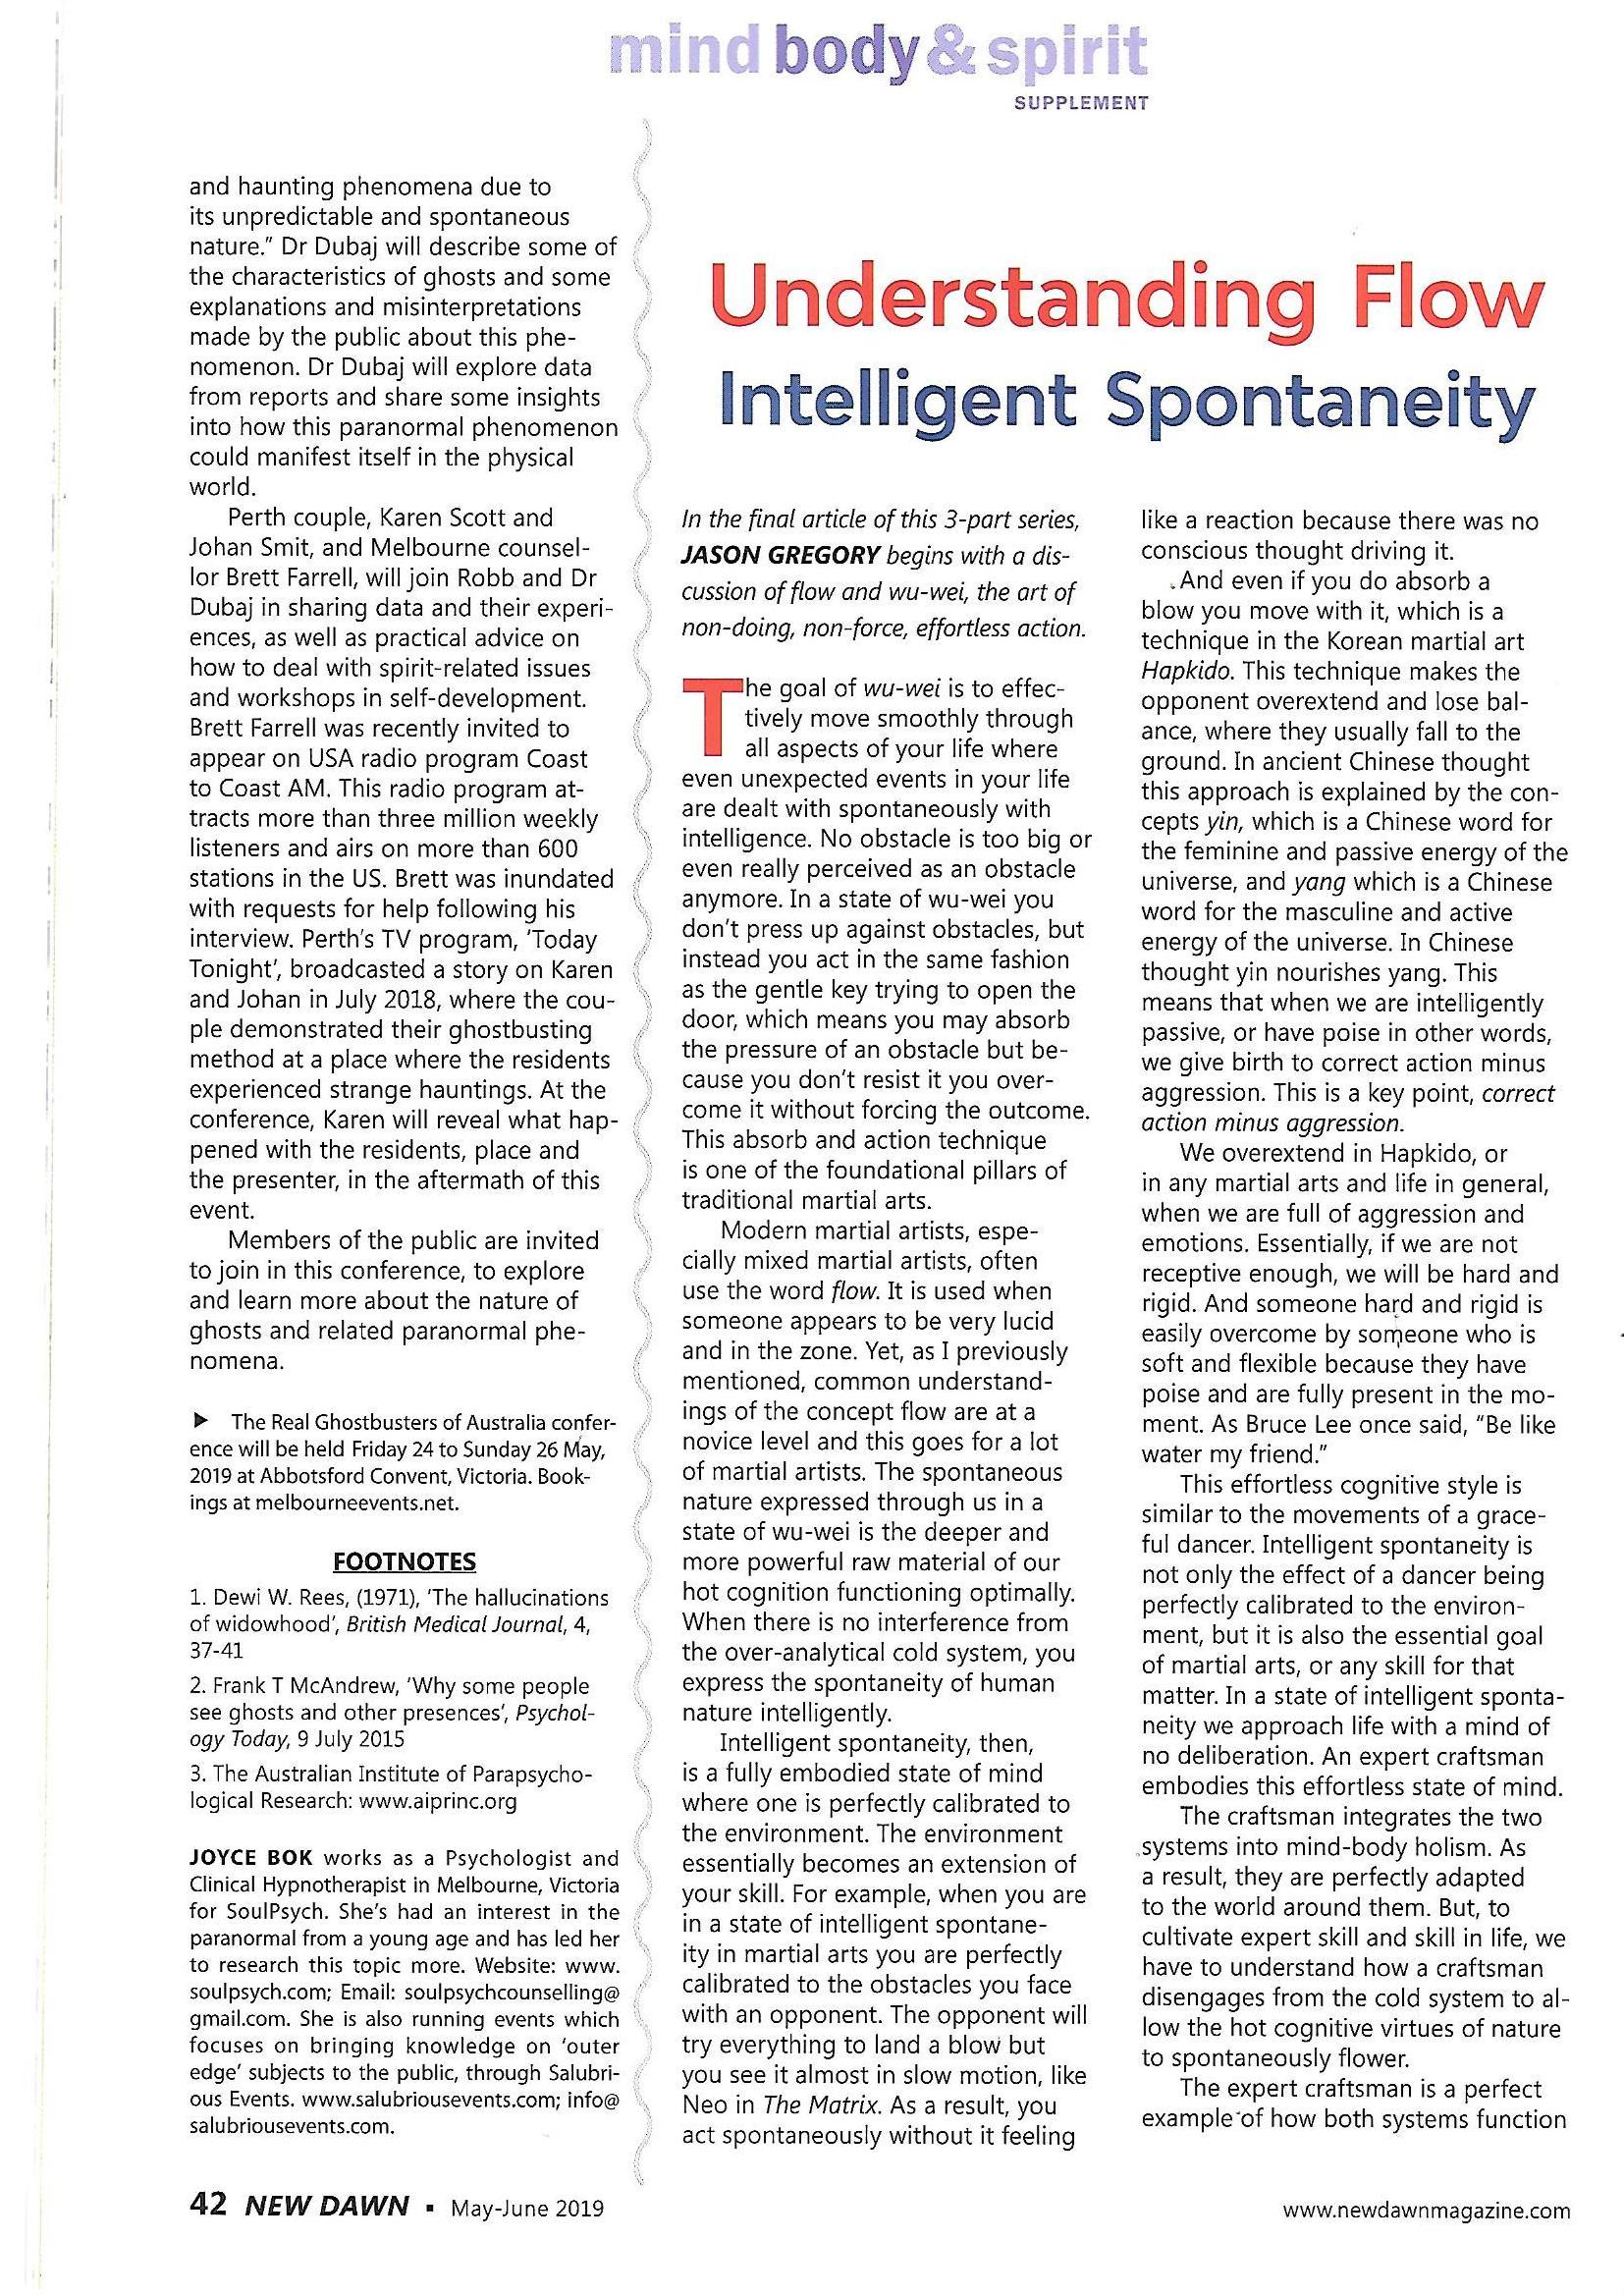 New Dawn article JBOK pg3.jpg